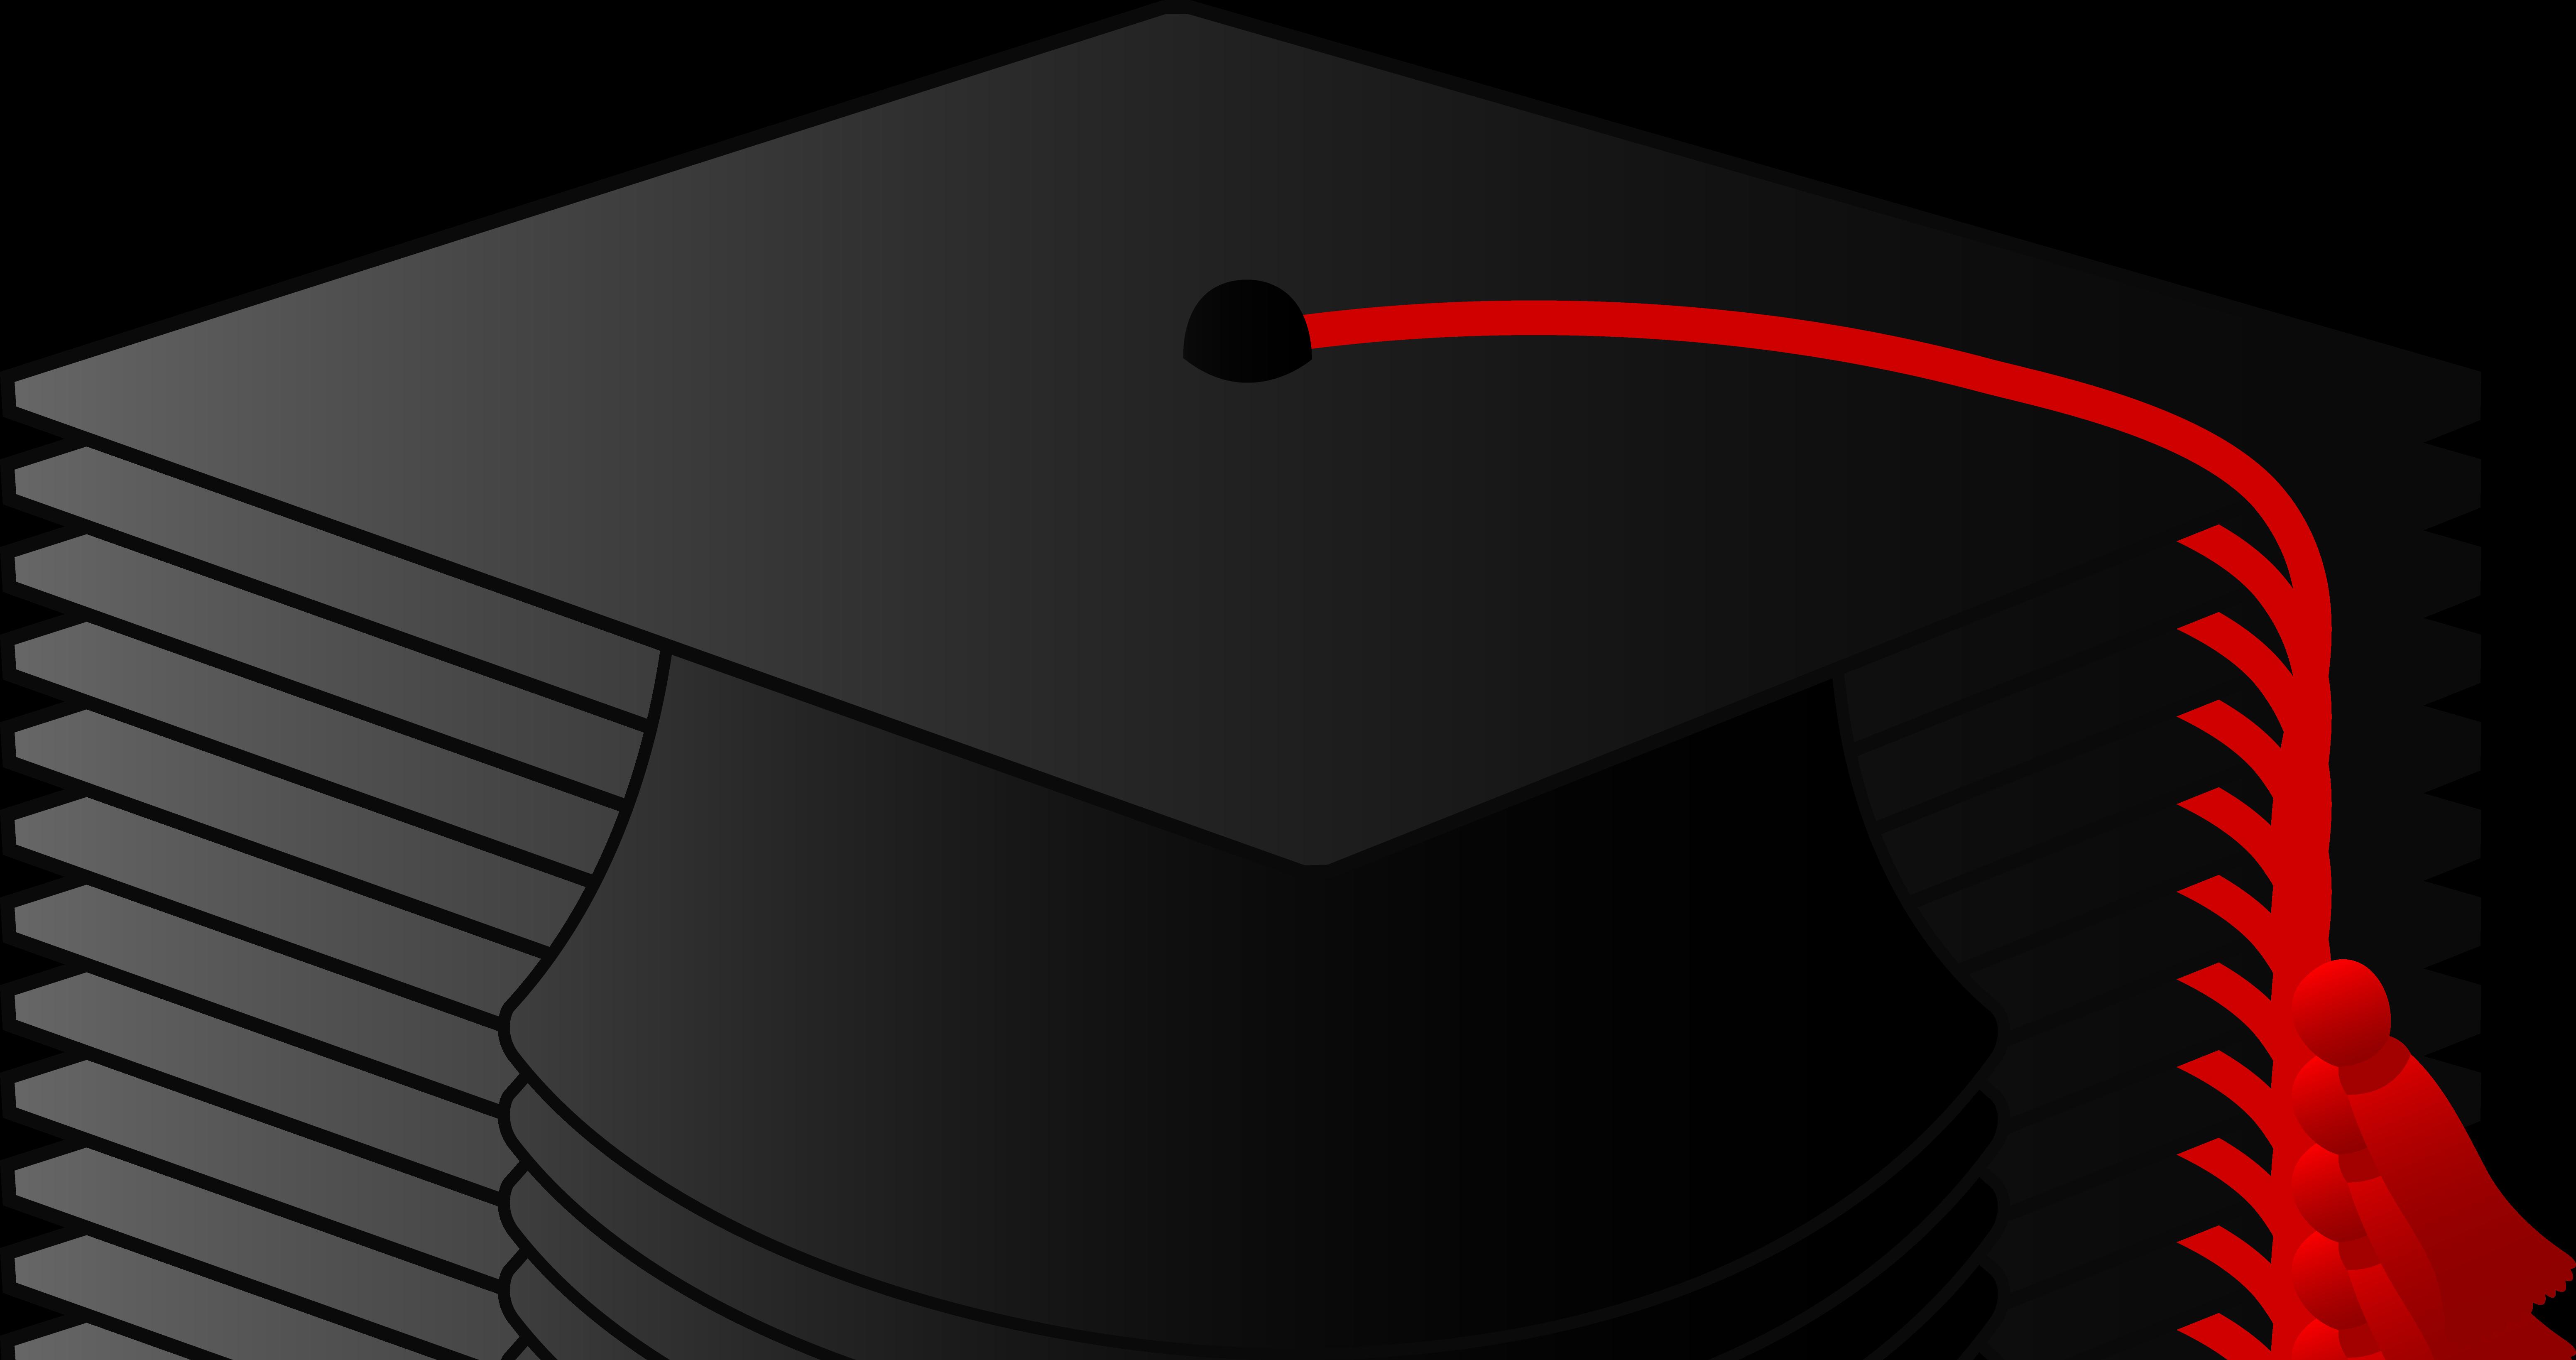 6204x3275 Red Graduation Tassel Clip Art Cliparts